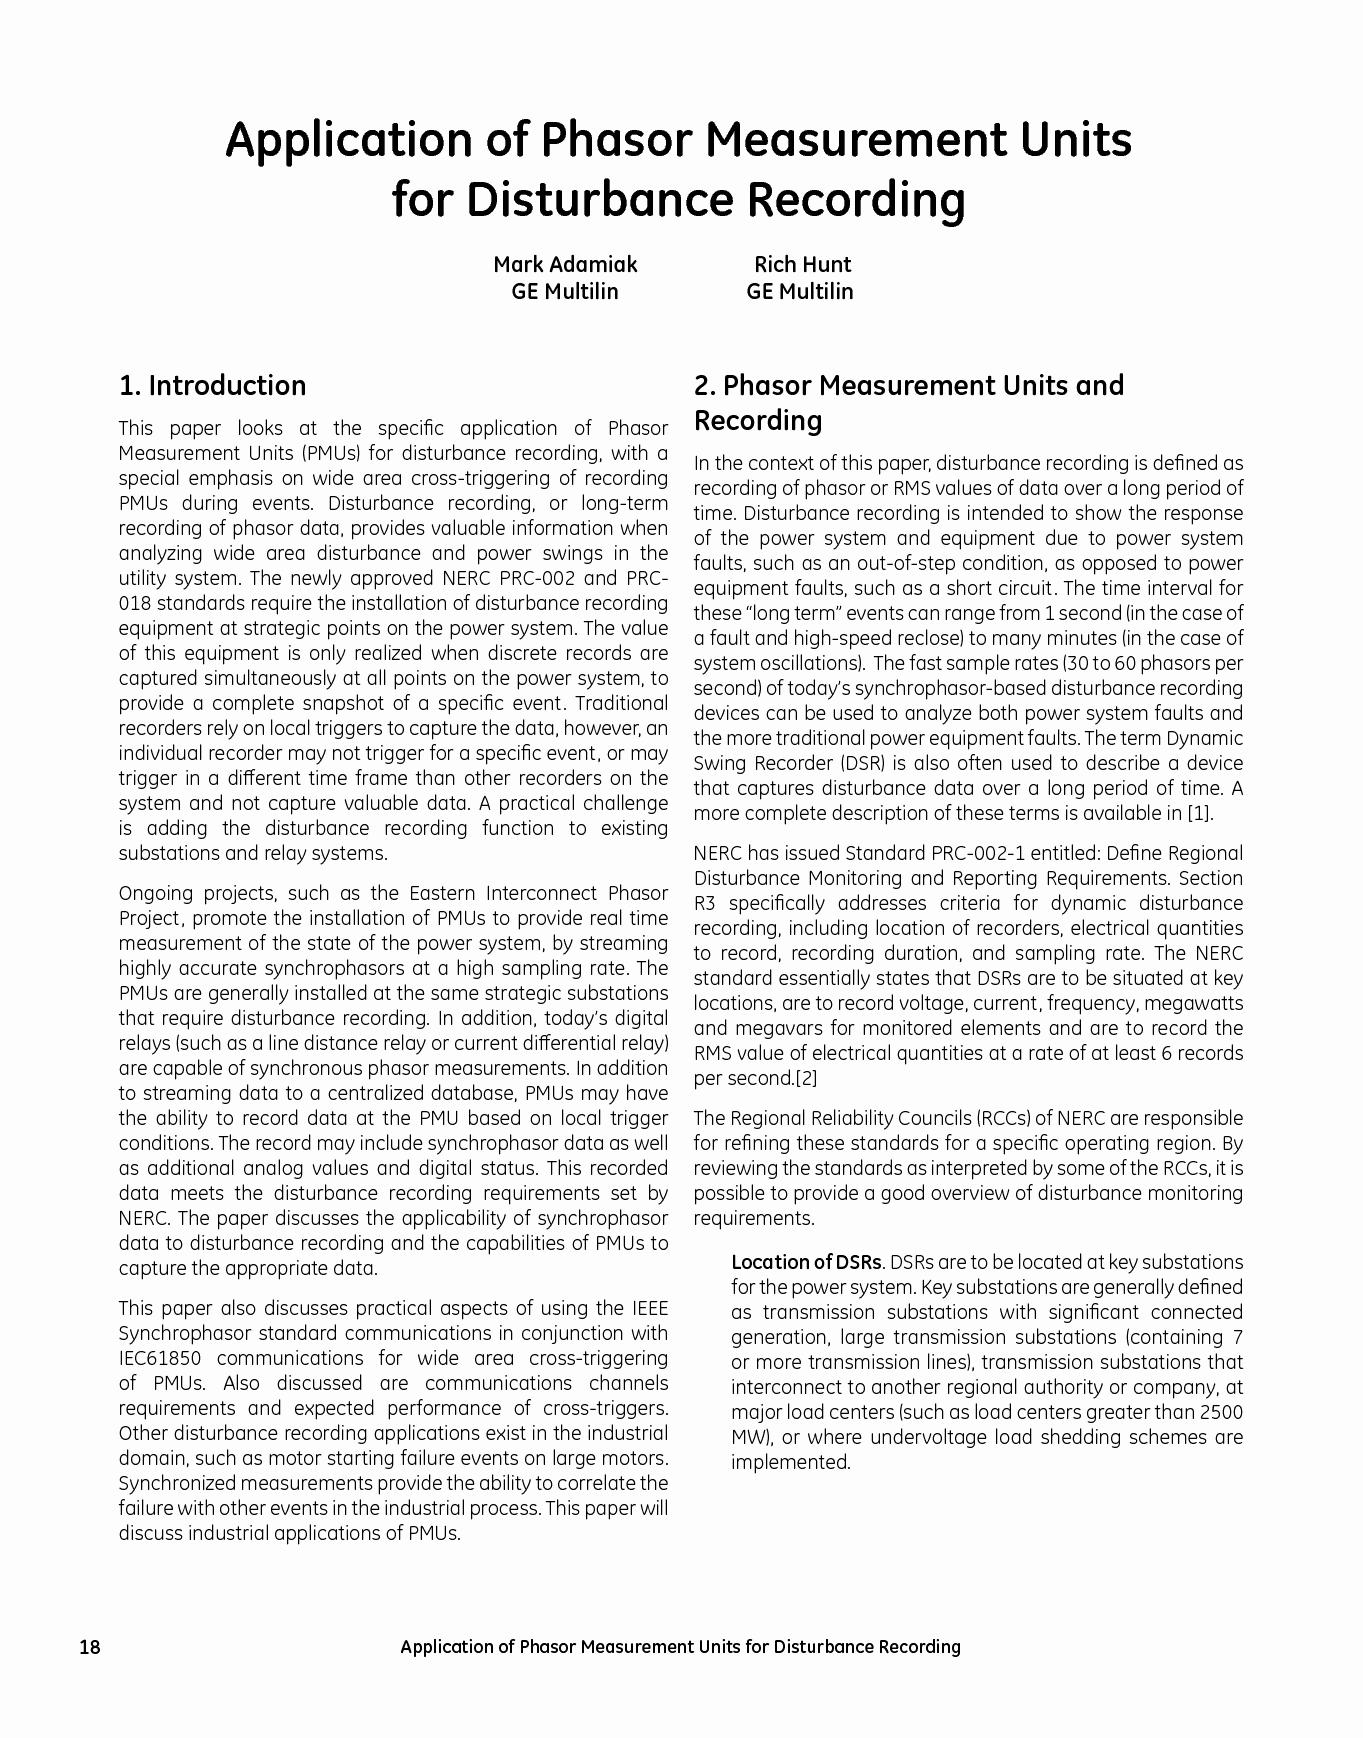 50 Measuring Units Worksheet Answer Key